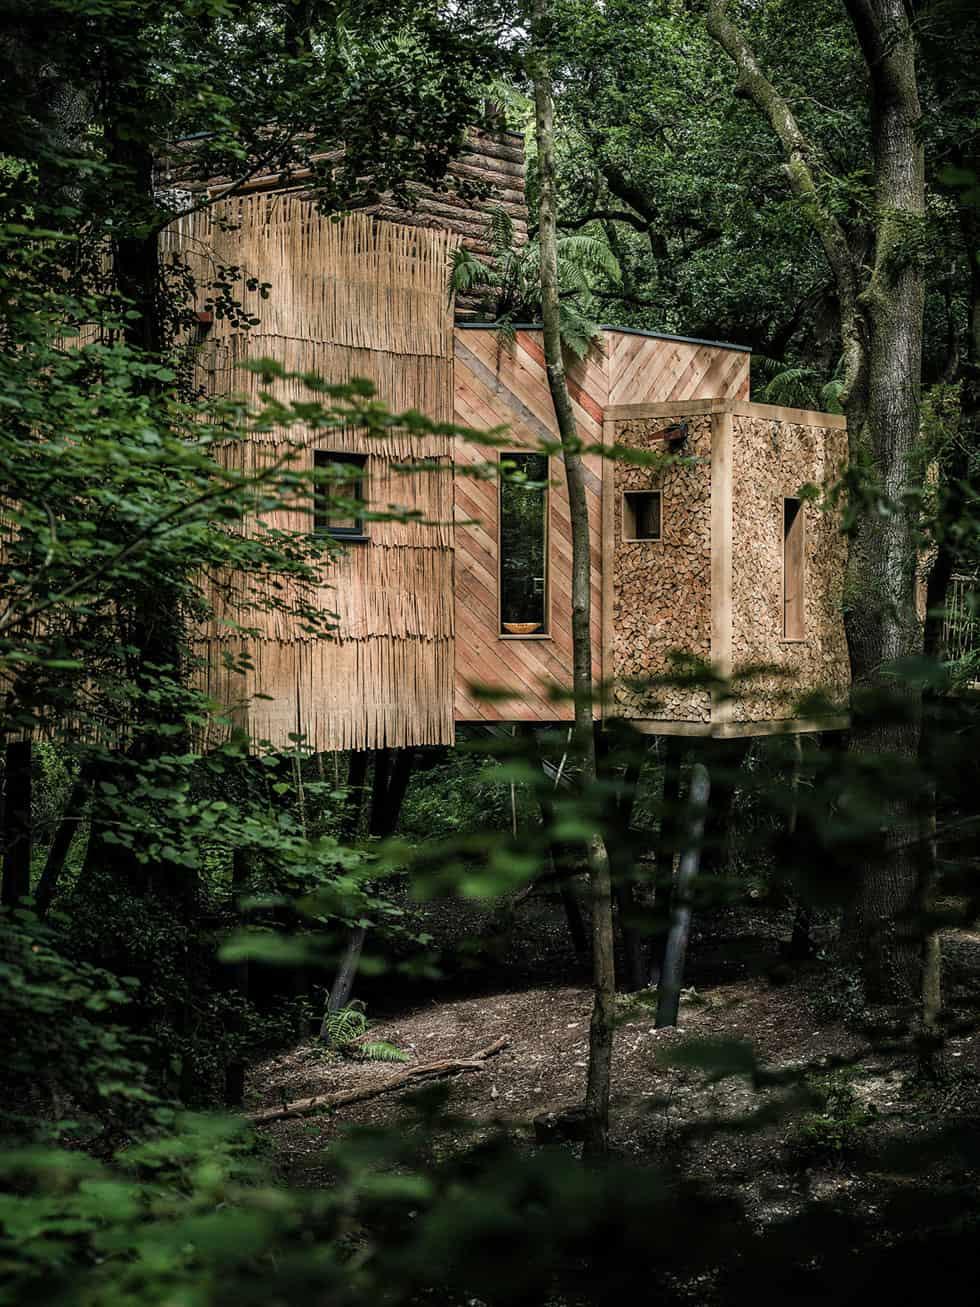 The Woodman's Treehouse by Mallinson Ltd & BEaM studio (2)